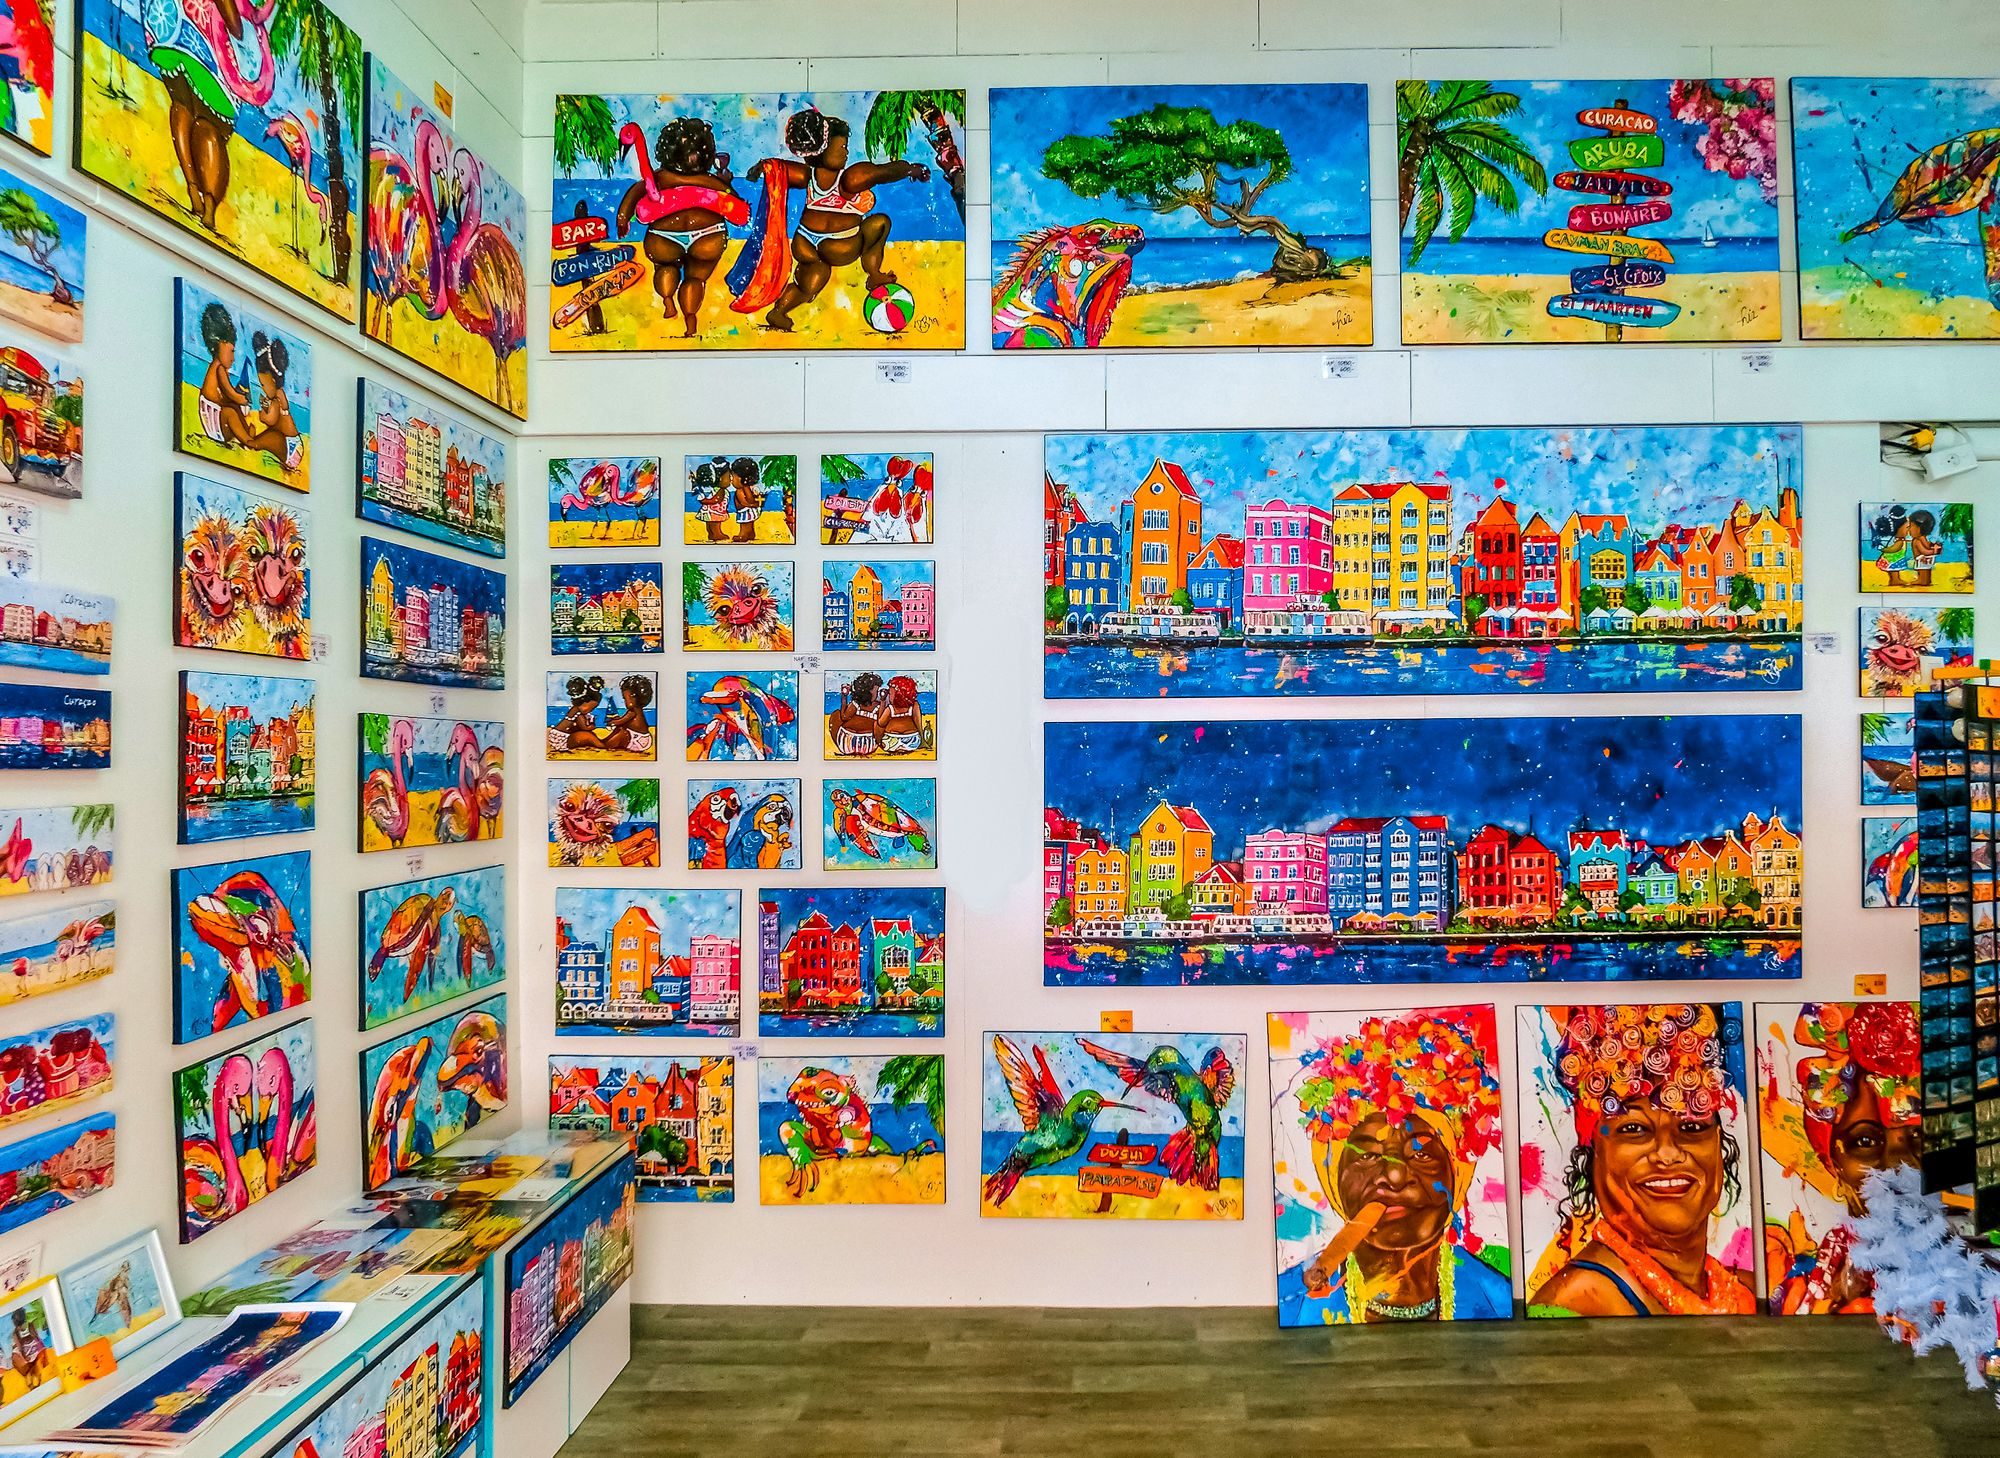 Curacao Artwork Paintings